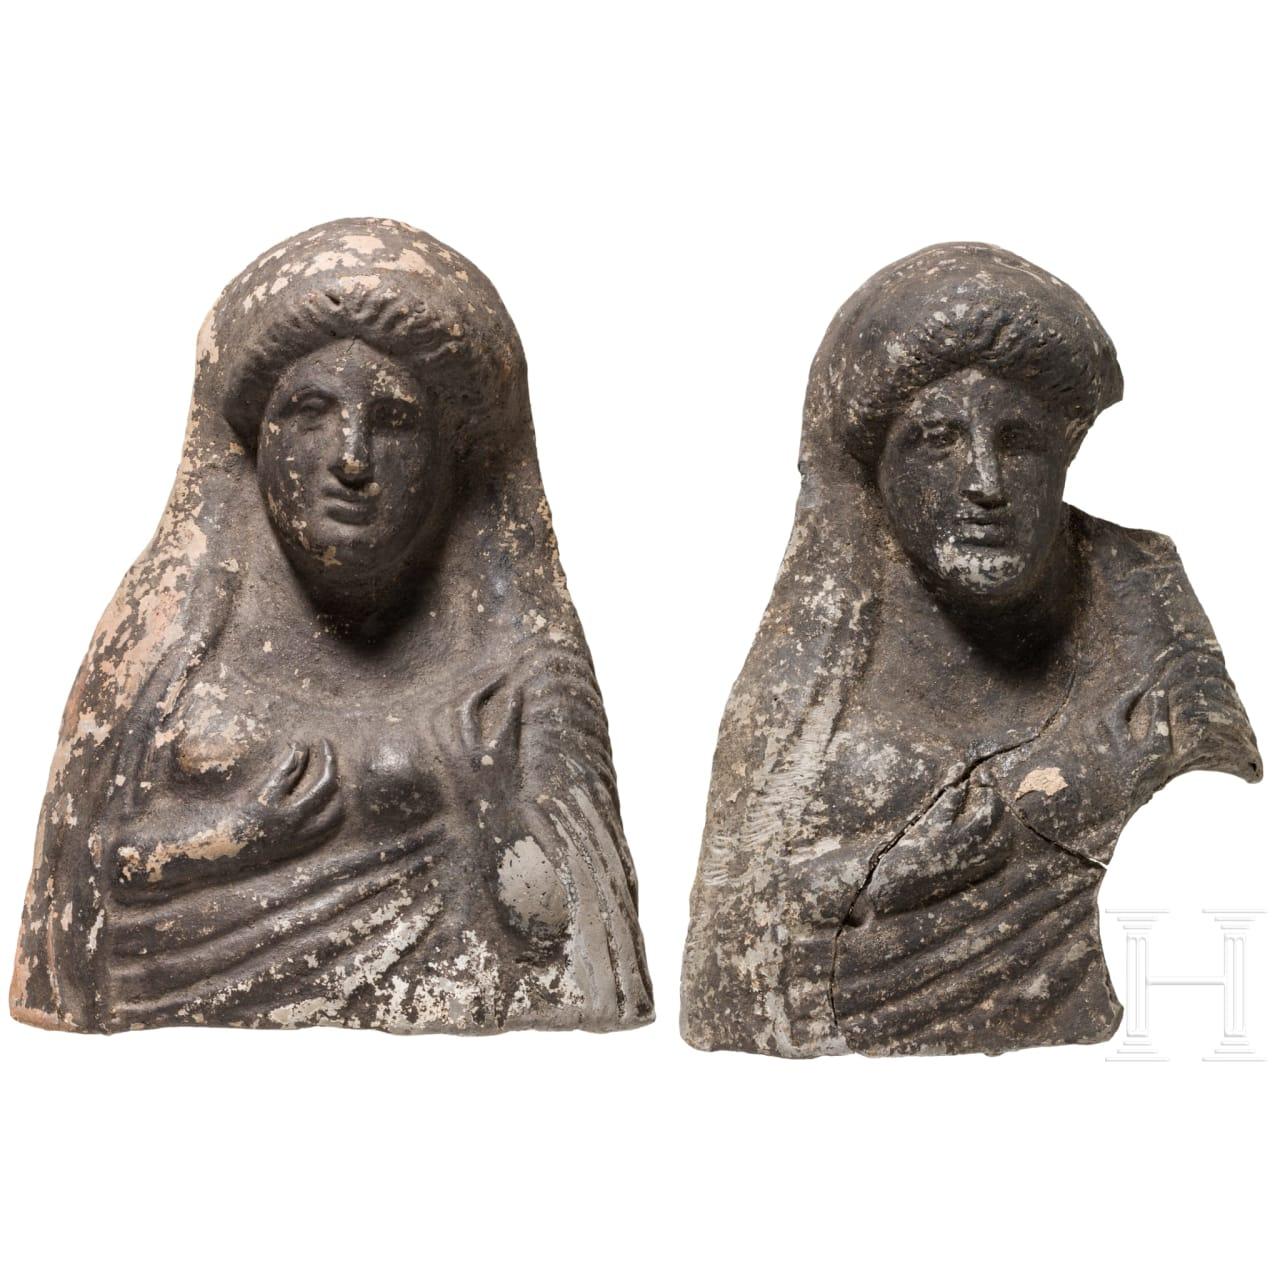 Zwei Votiv-Terrakotten, Griechenland, 5. Jhdt. v. Chr.